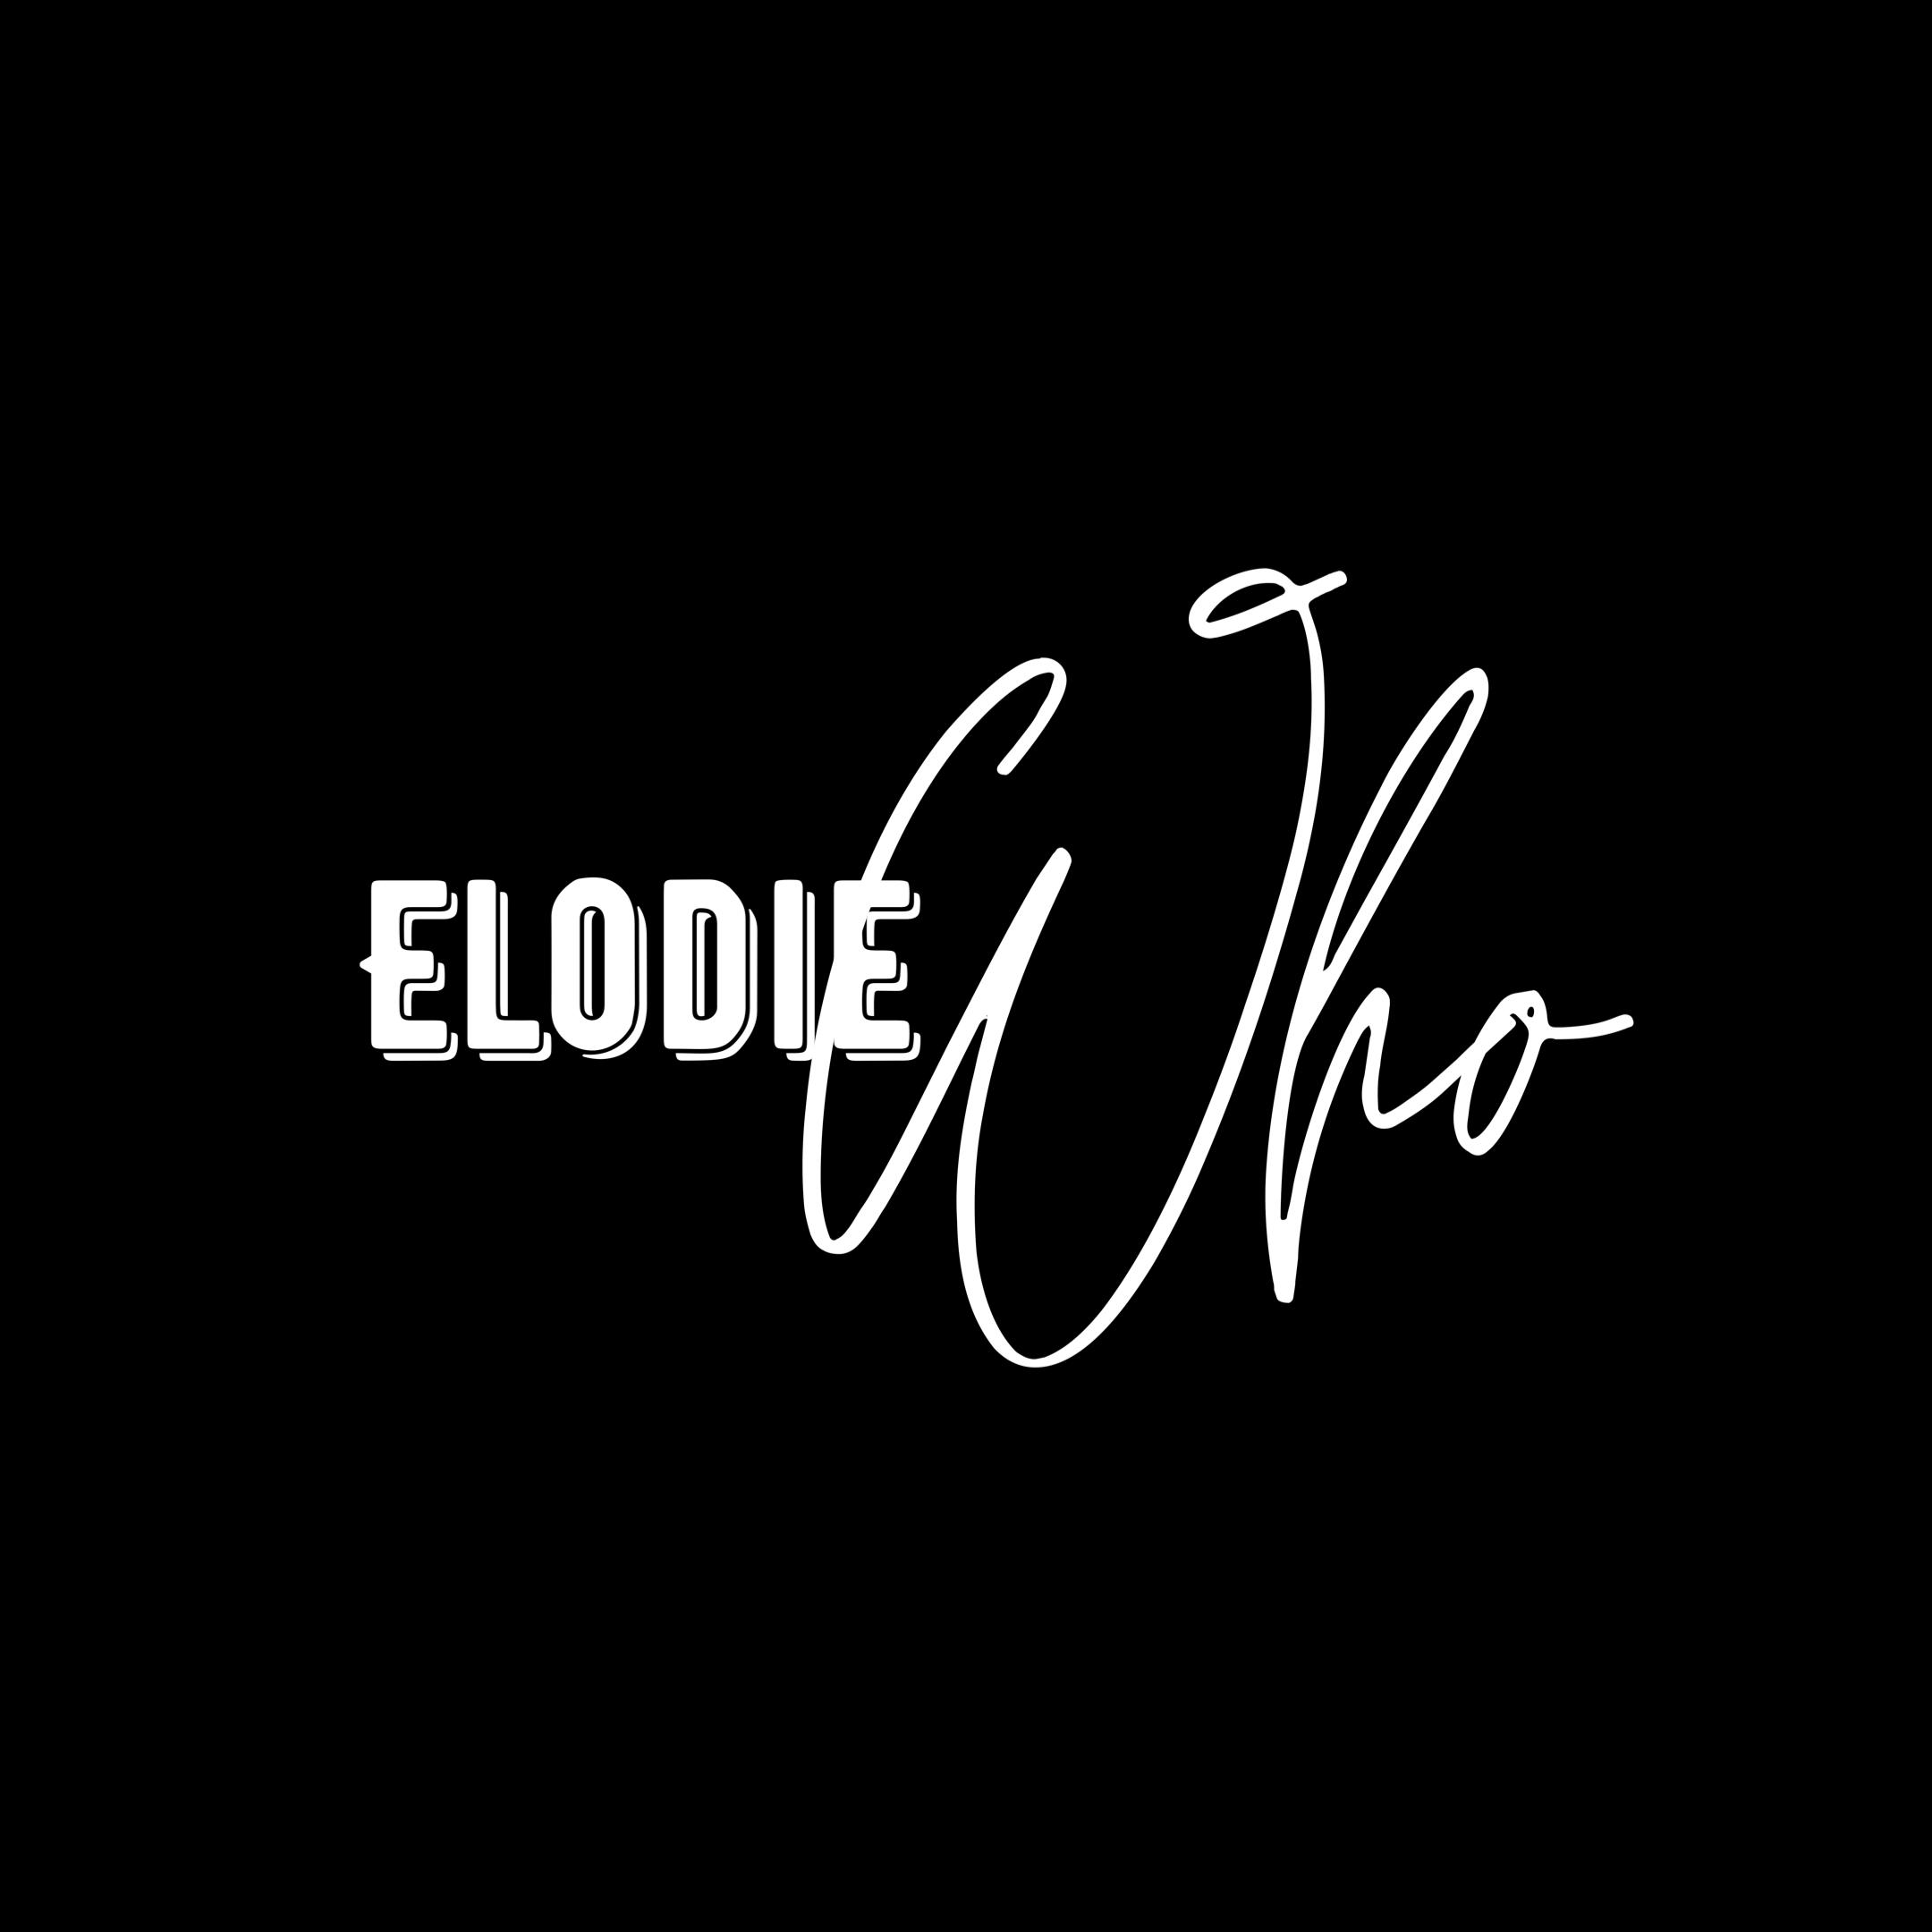 Elodie Who